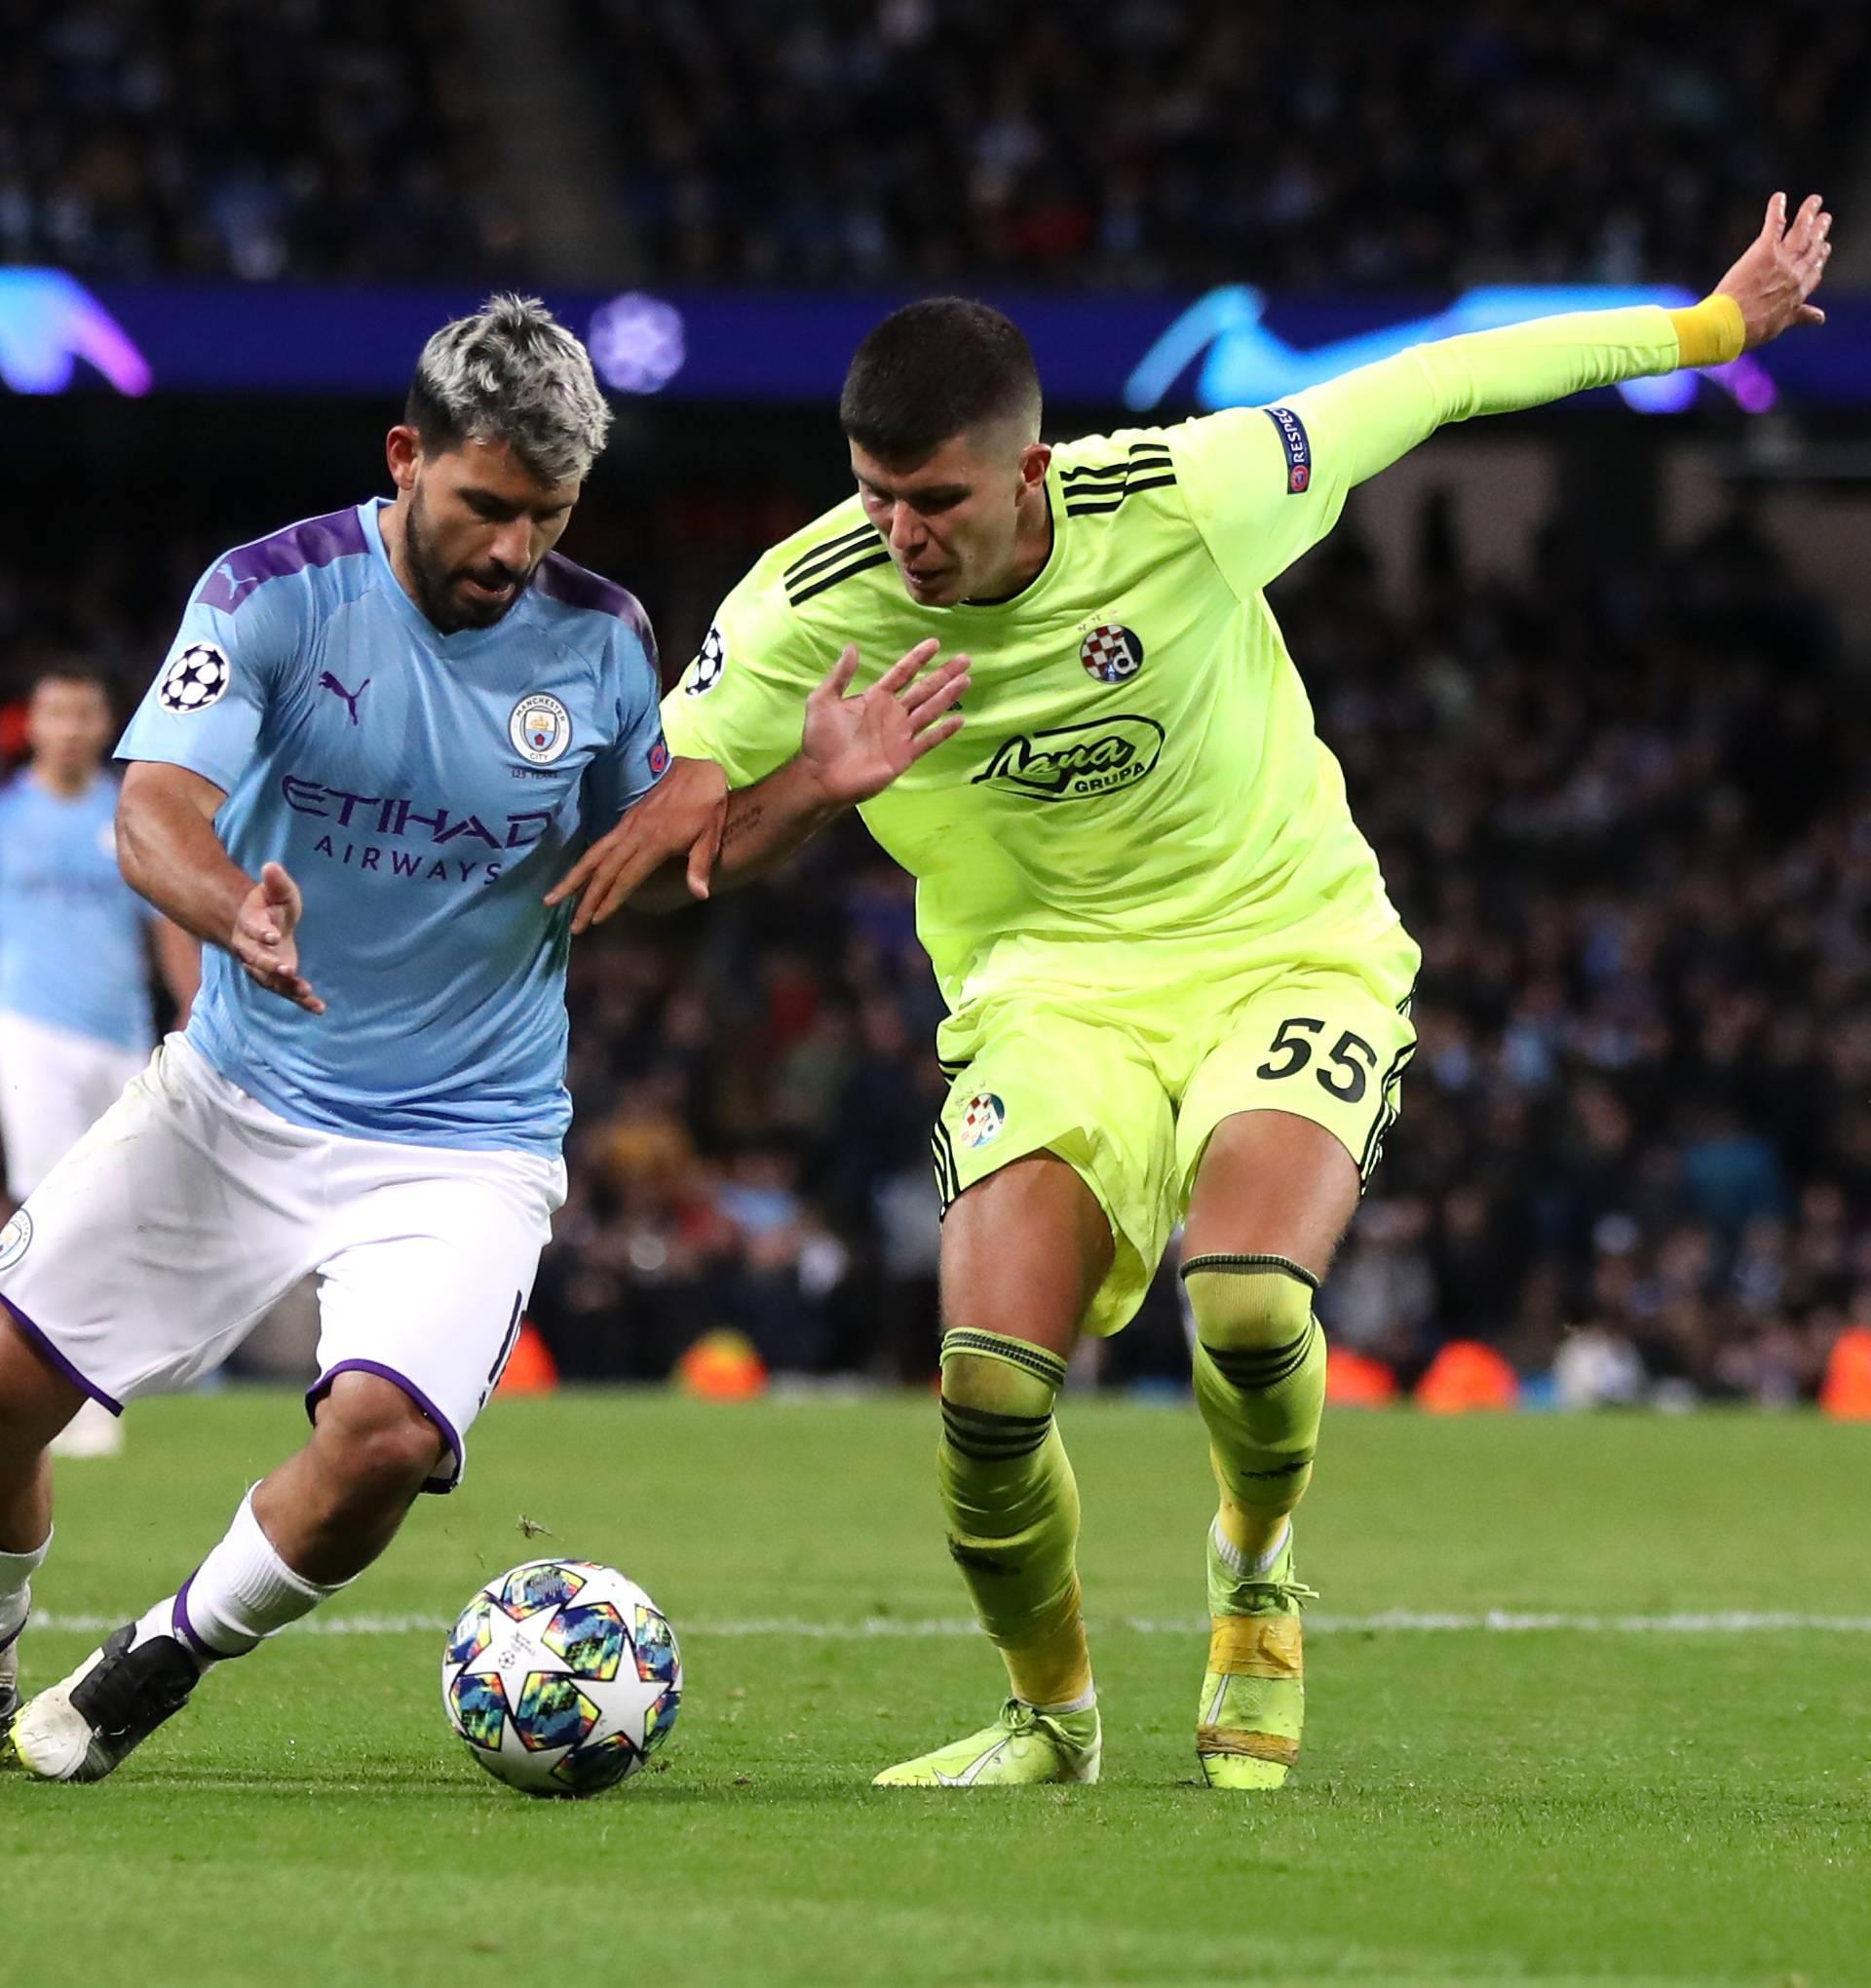 Manchester City v Dinamo Zagreb - UEFA Champions League - Group C - Etihad Stadium